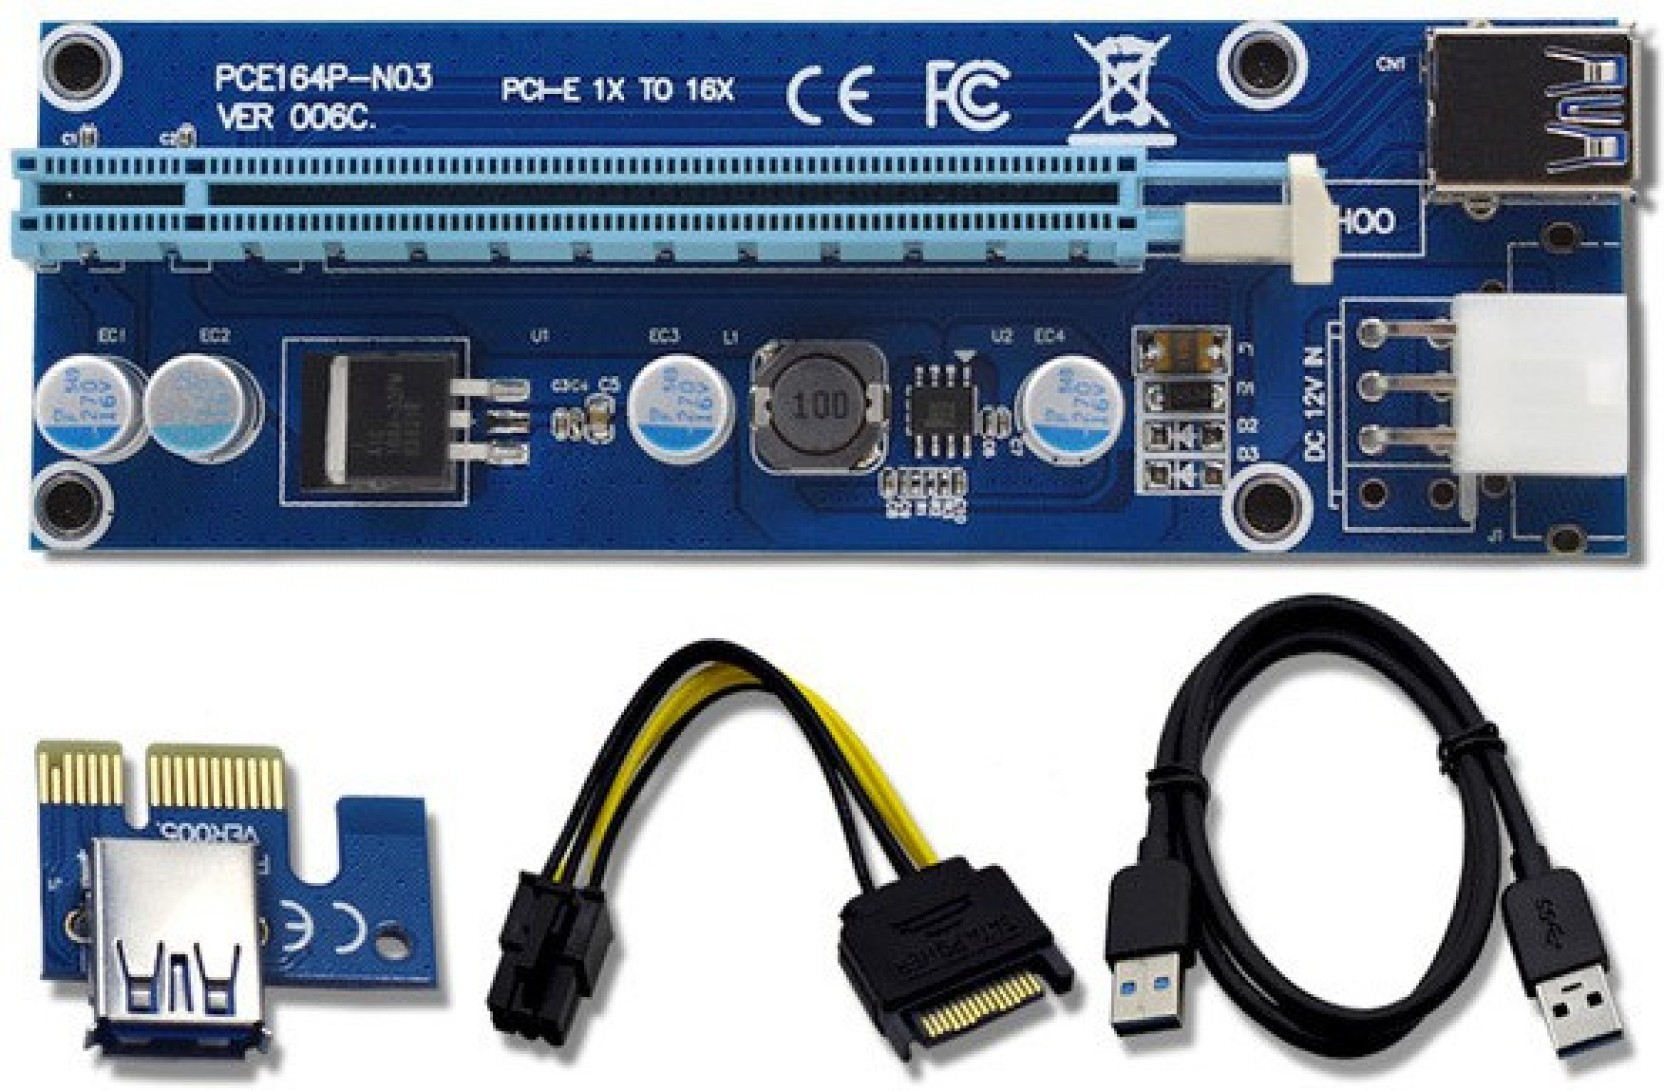 Terabyte Pci E Express Riser Card 1x To 16x Usb 30 Data Cable Pcie Sata Add Cart